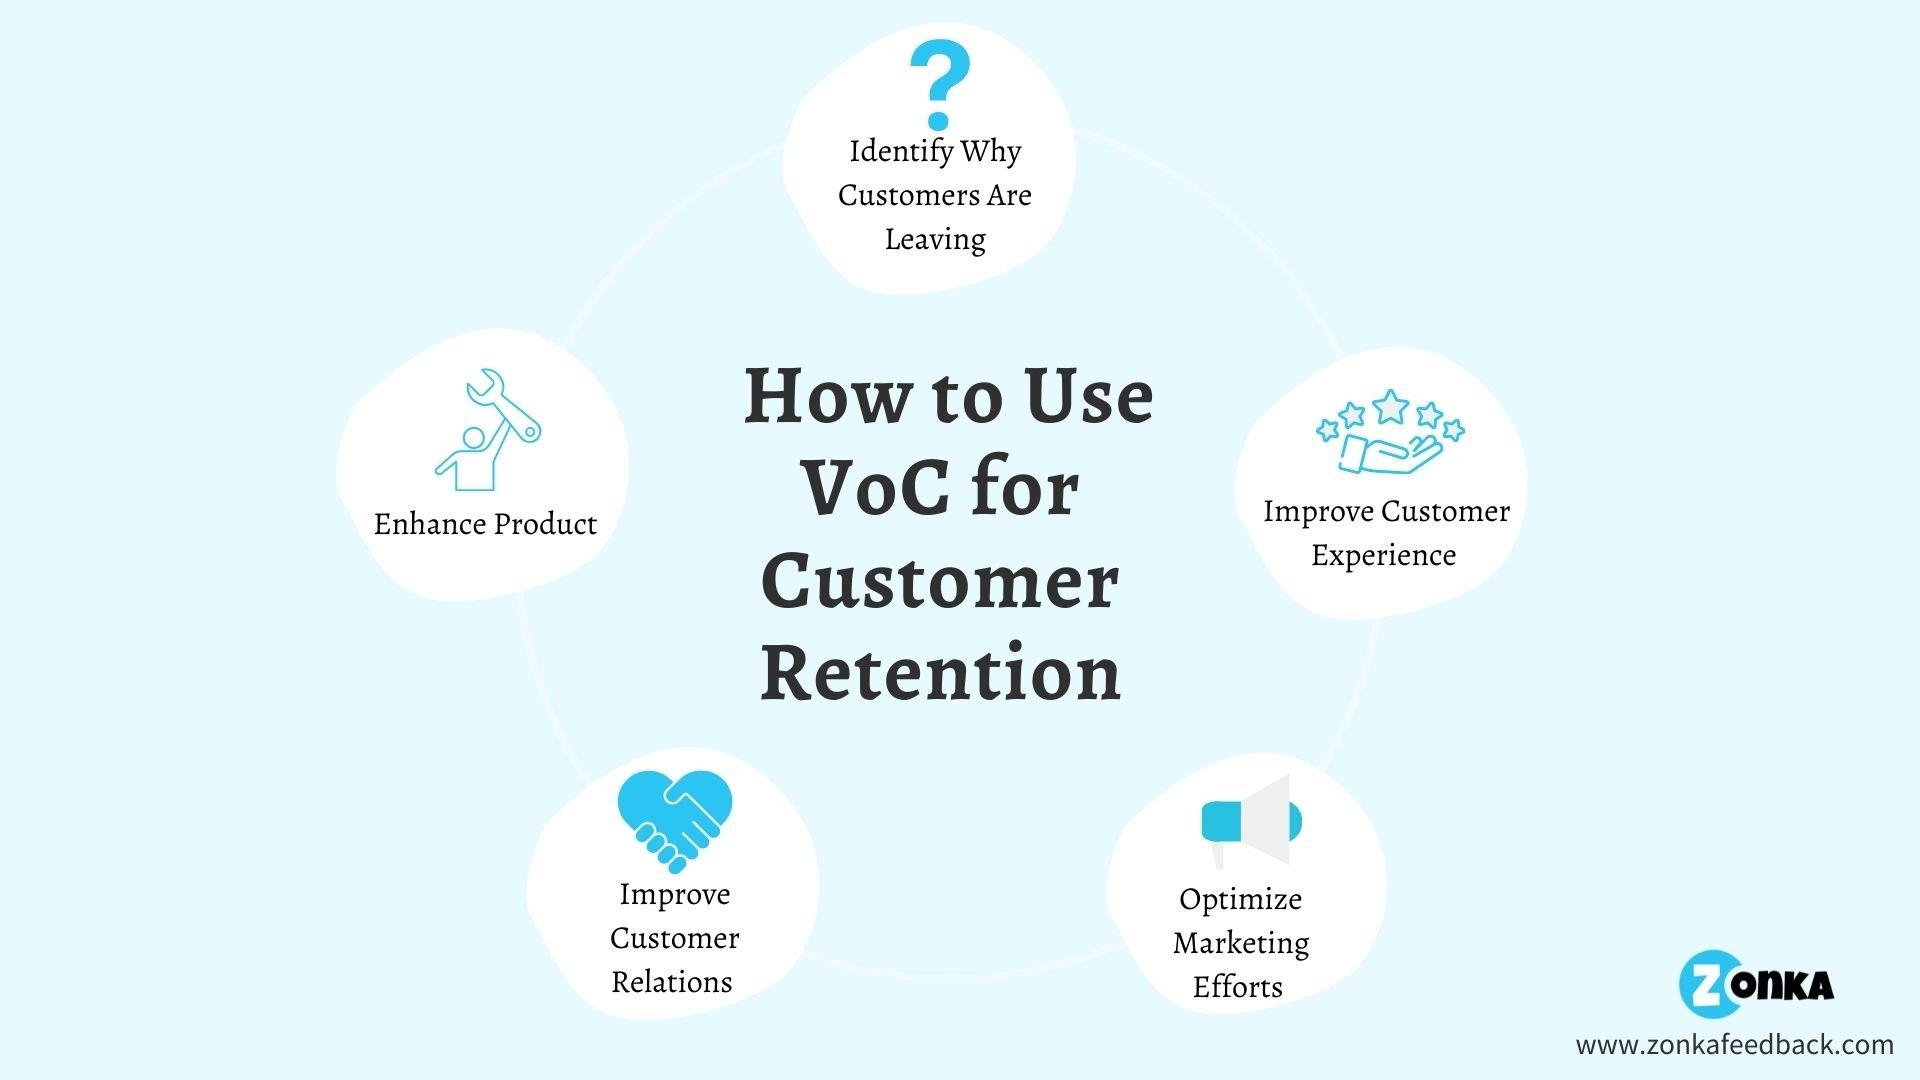 Voice of Customer for customer retention